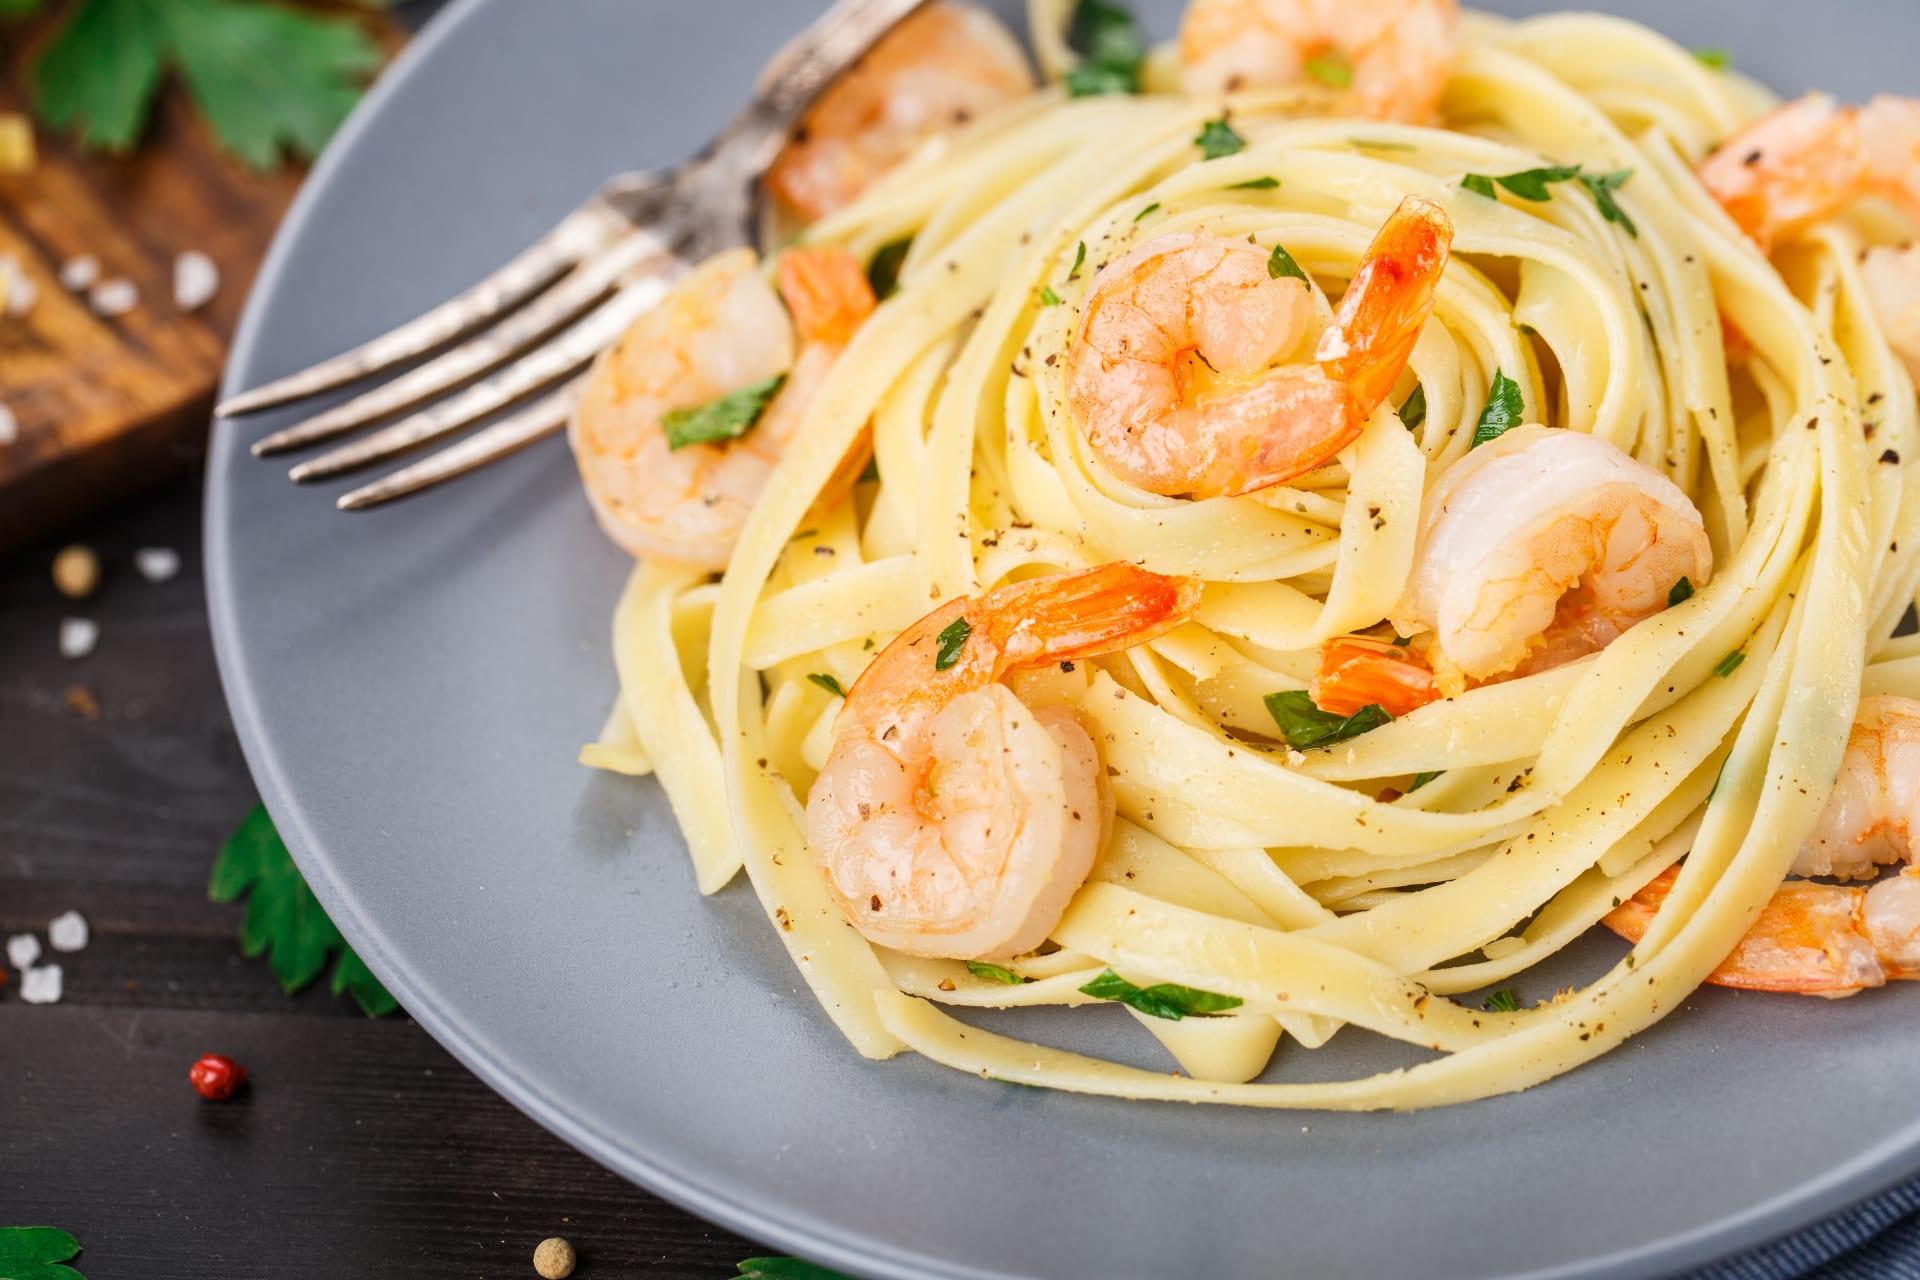 Rome - Summer Special - Tagliatelle Zucchini & Shrimps with Lemon scent